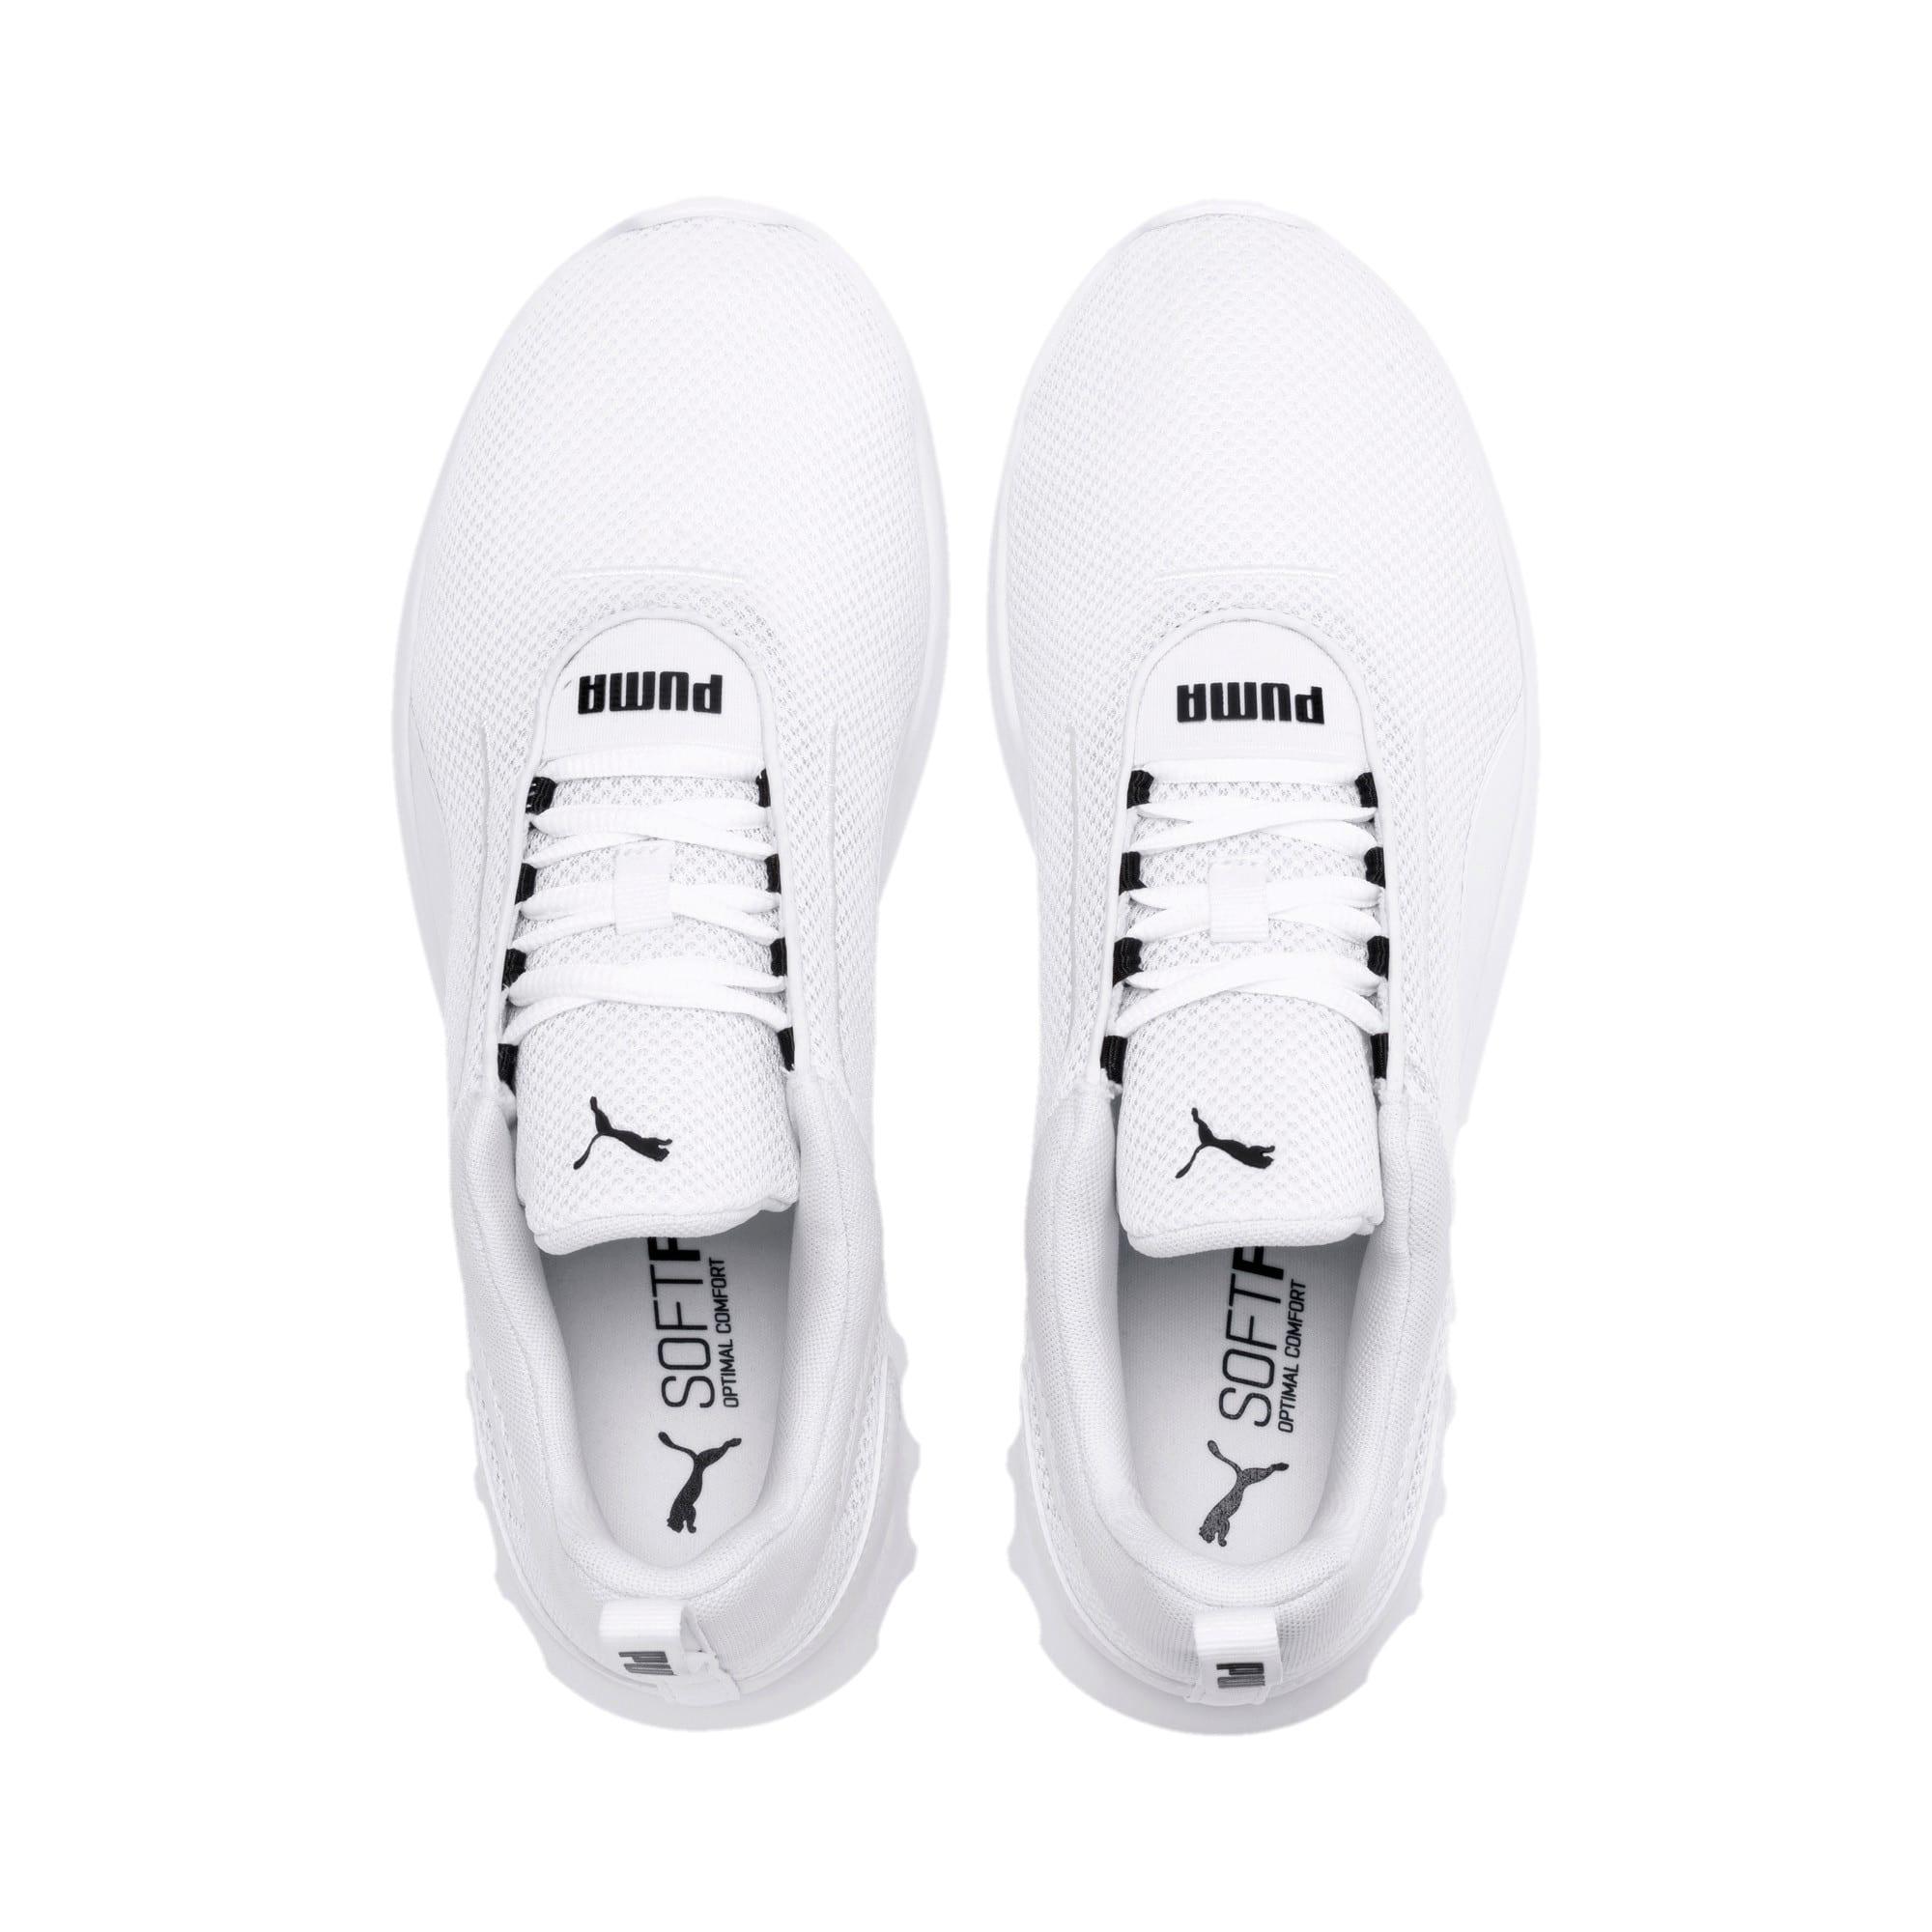 Thumbnail 6 van Carson 2 Concave sportschoenen voor mannen, Puma White-Quarry-Puma Black, medium